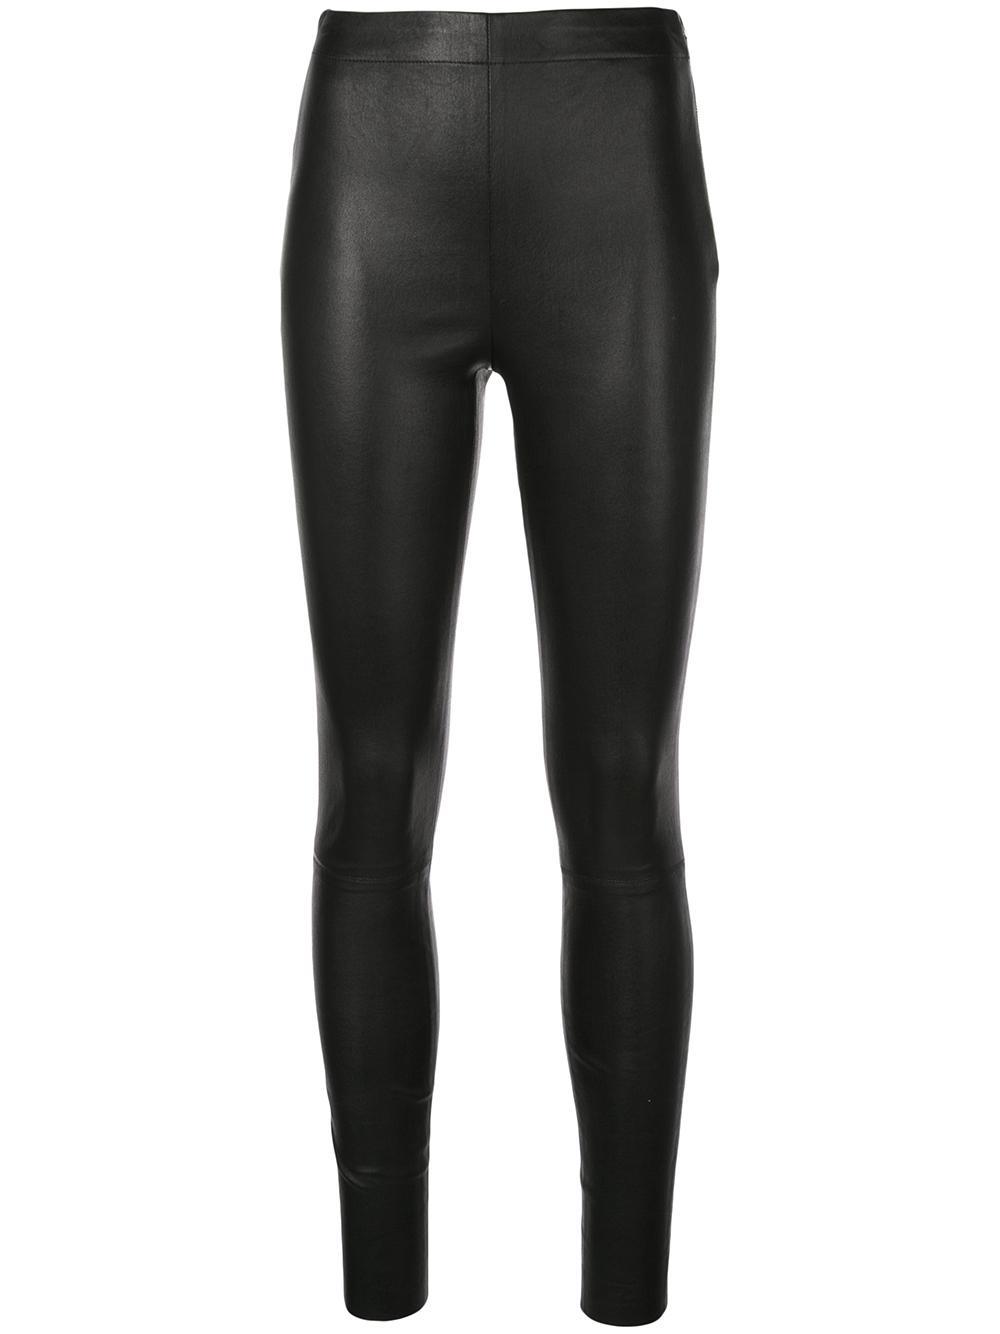 Maddox Leather High Waisted Legging Item # CC000104105